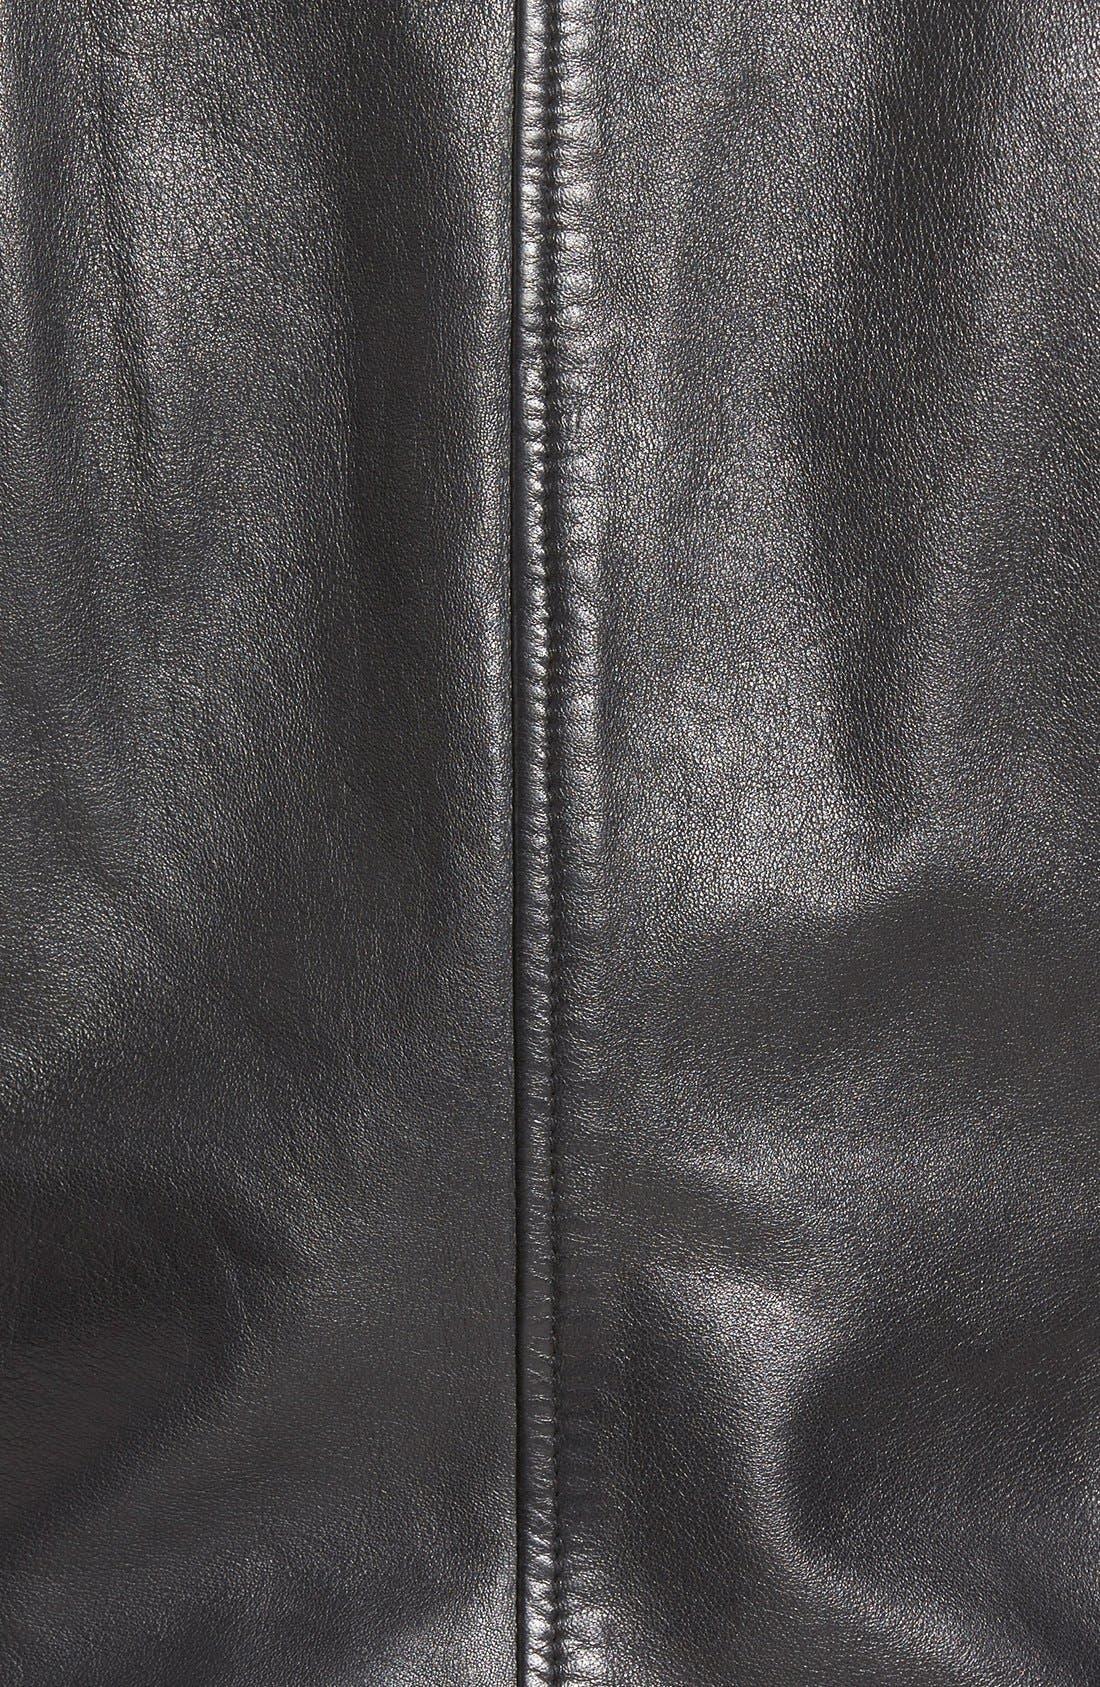 Zip Front Leather Jacket,                             Alternate thumbnail 9, color,